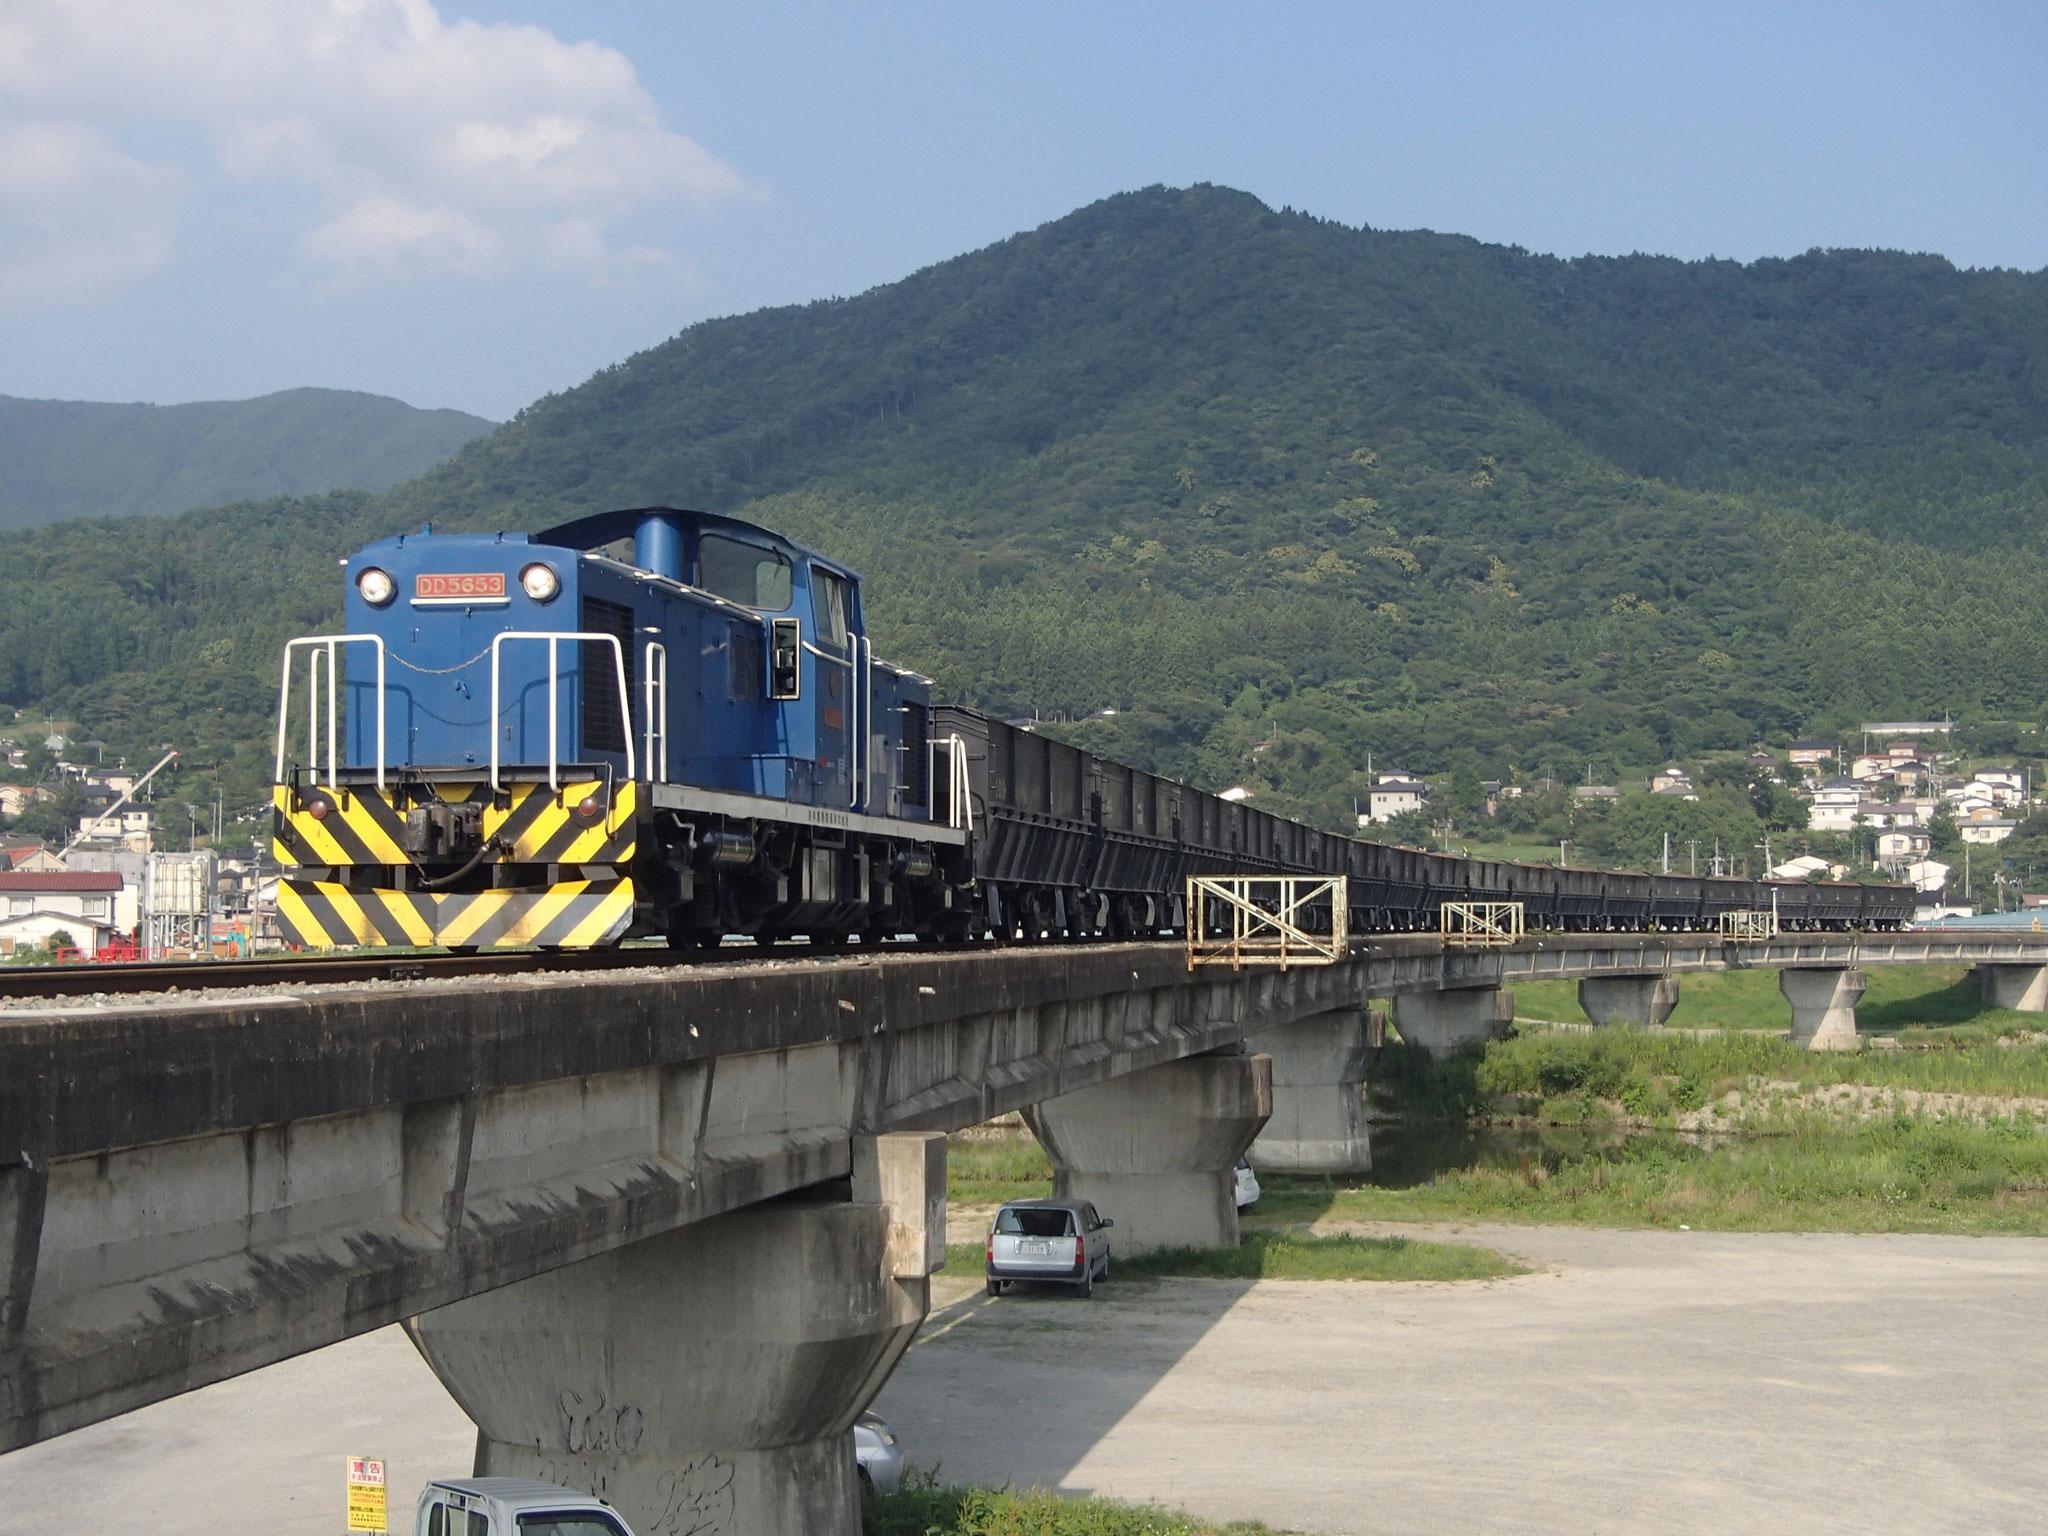 IWATE DEVELOPMENT RAILWAY